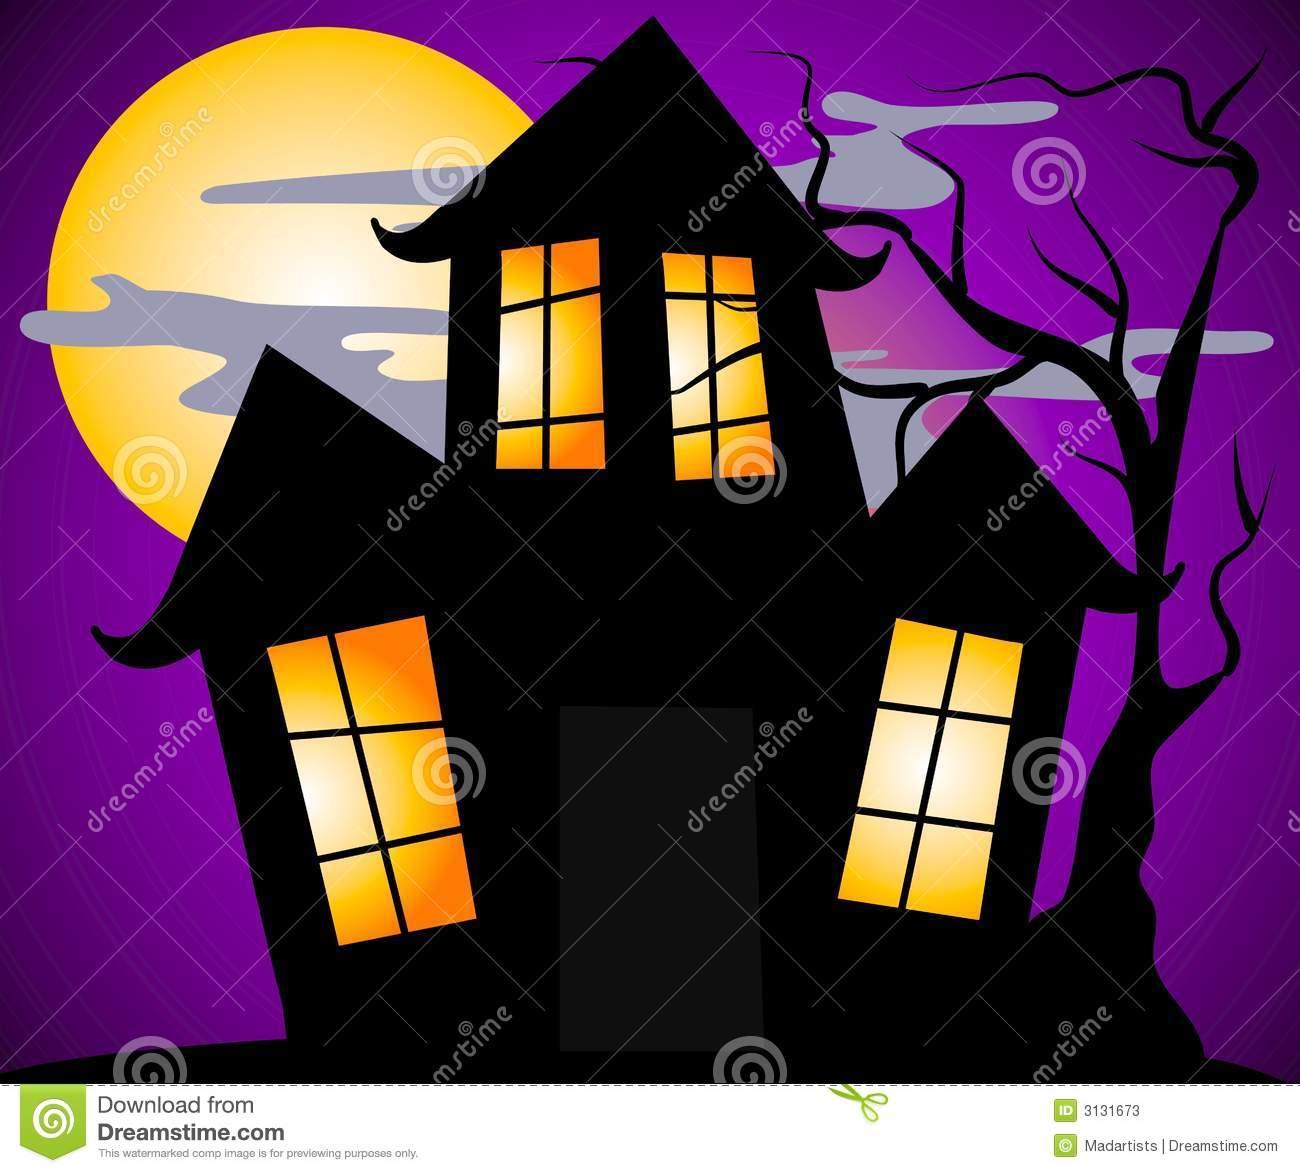 Haunted House Scene Royalty Free Stock Image.